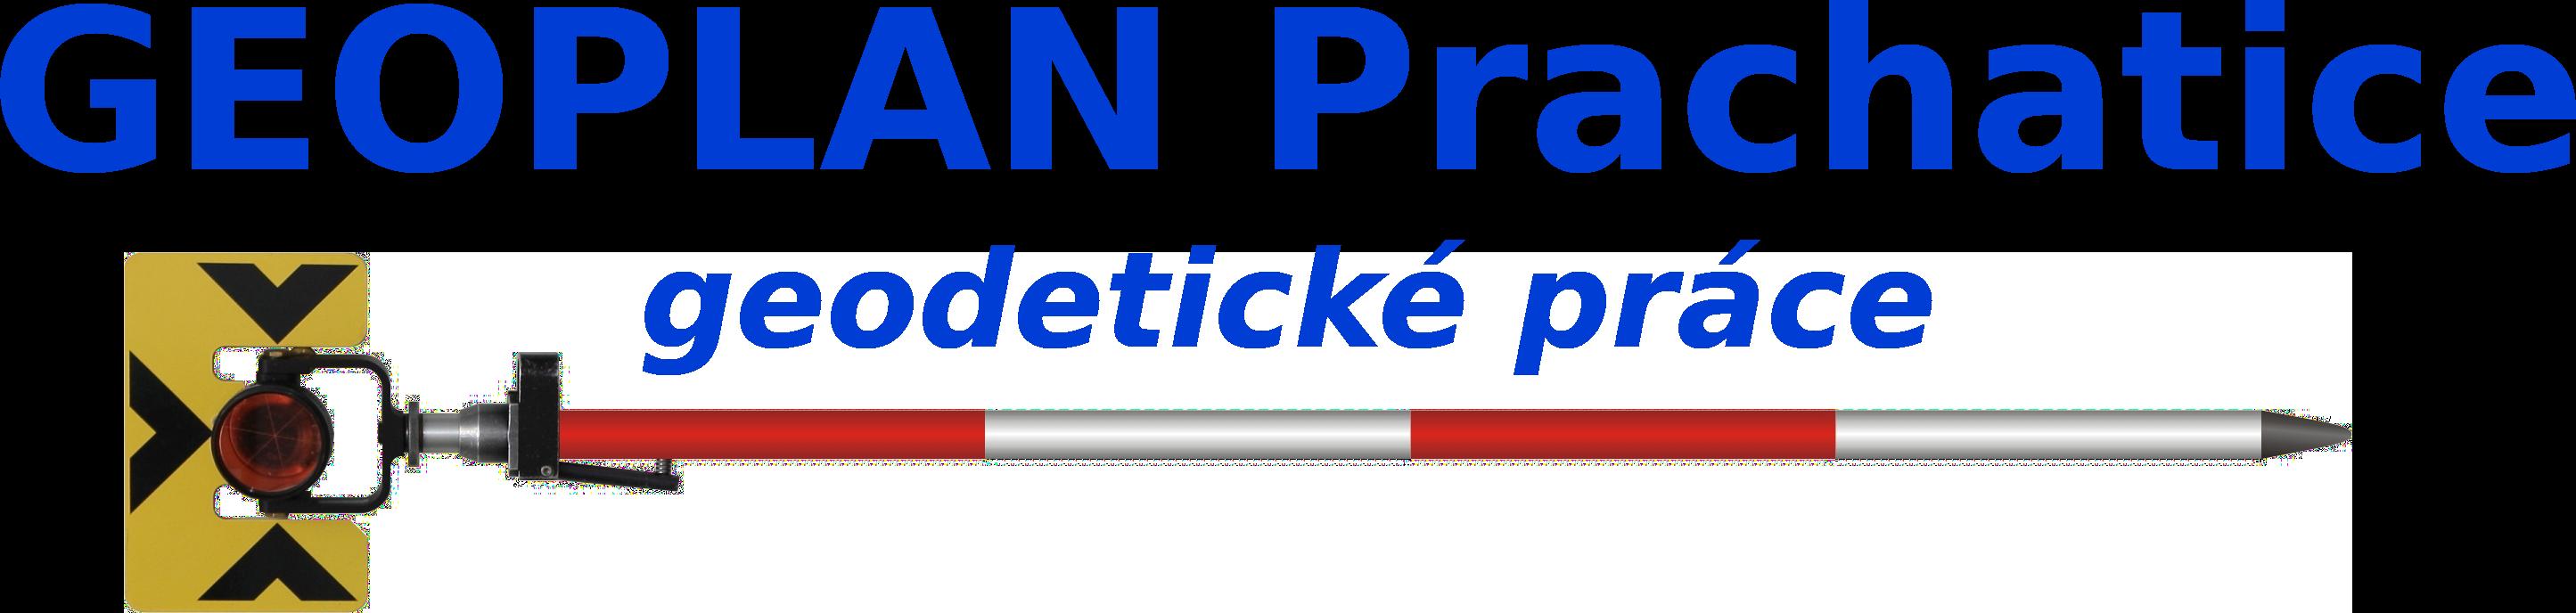 GEOPLAN Prachatice